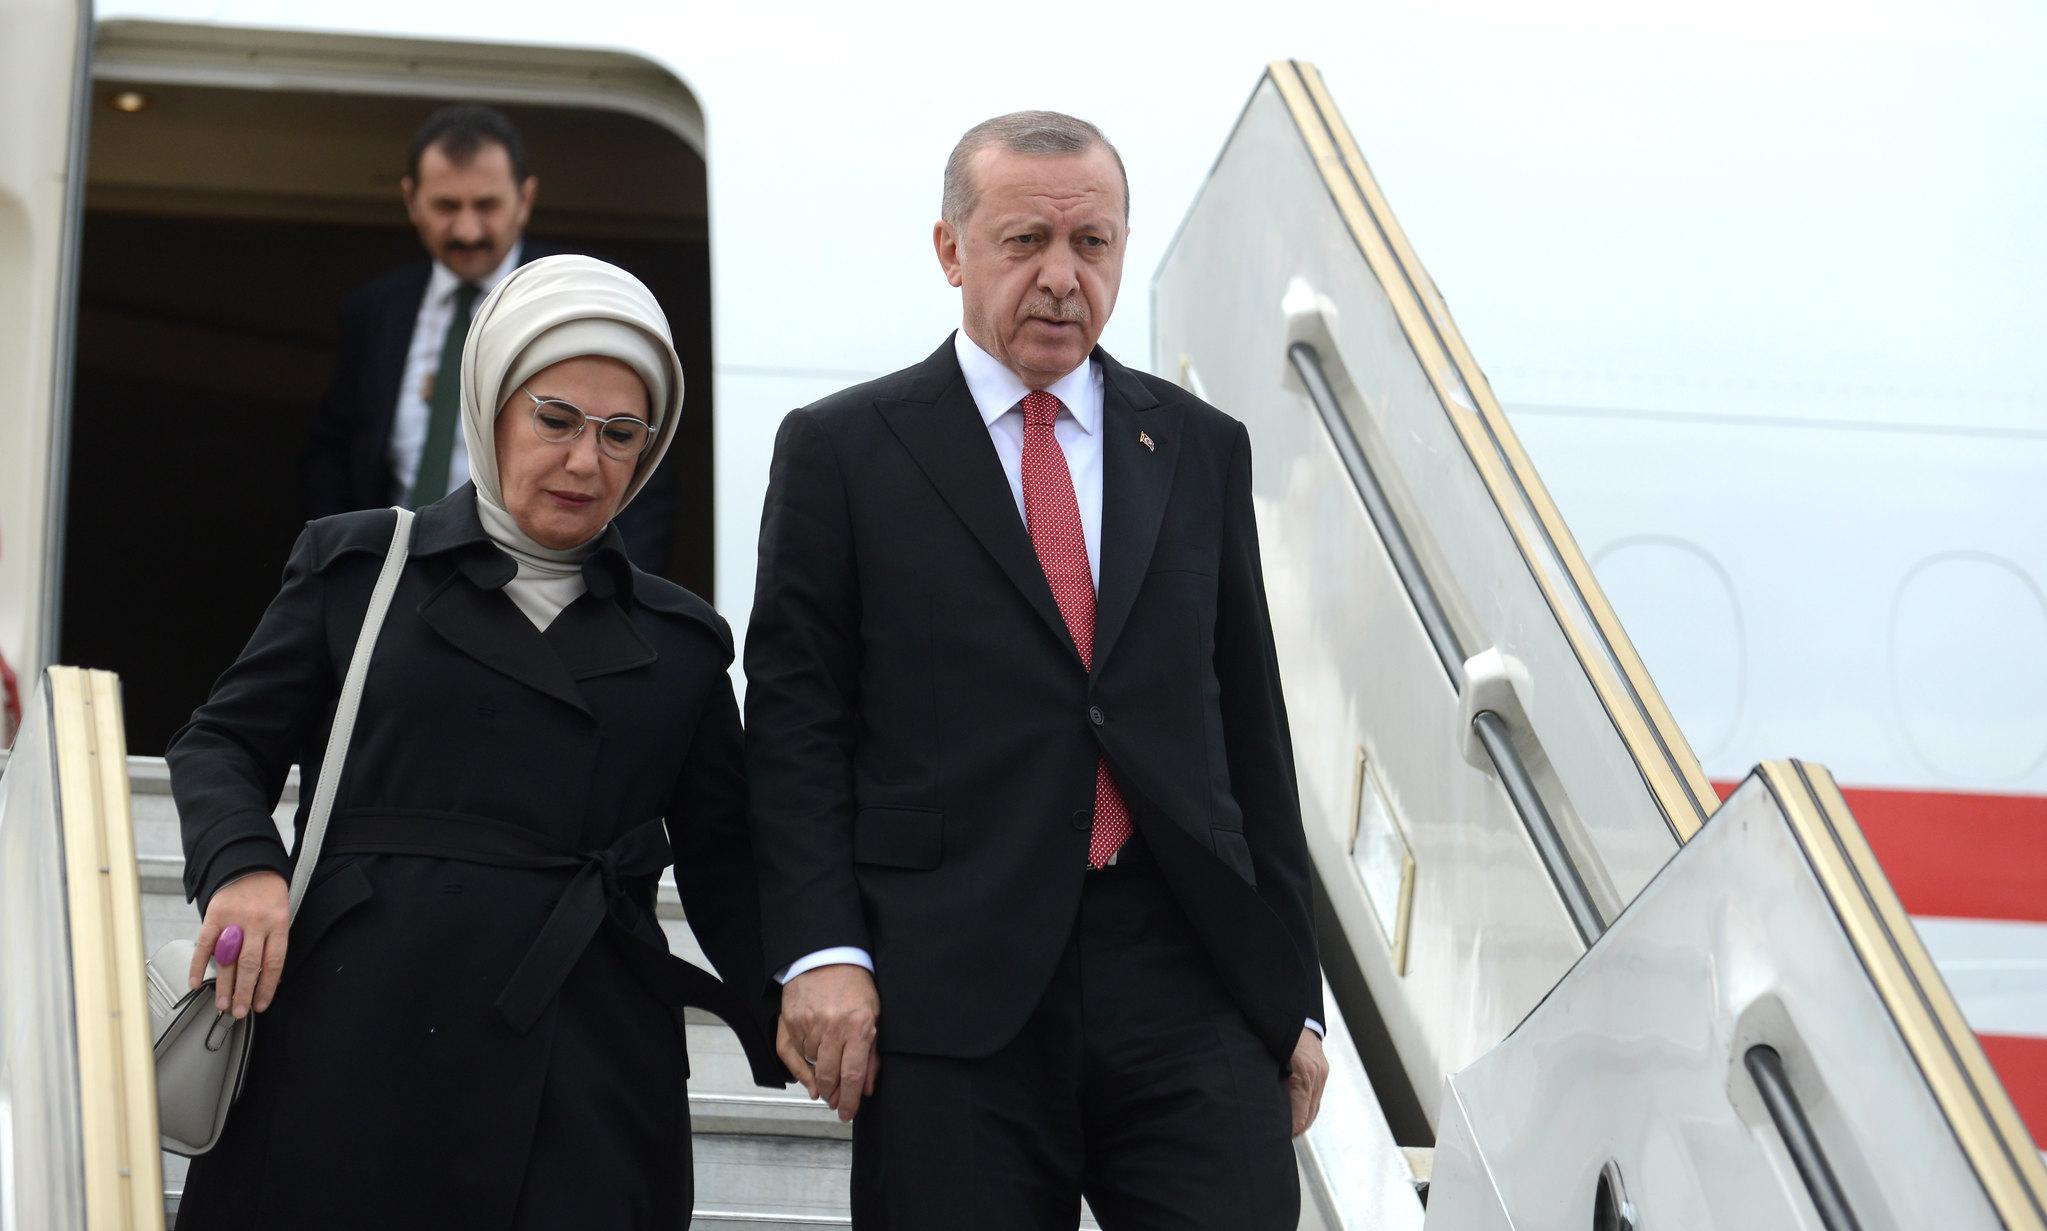 turkish-president-tayyip-erdogan-photo-credit-g20-argentina-on-flickr